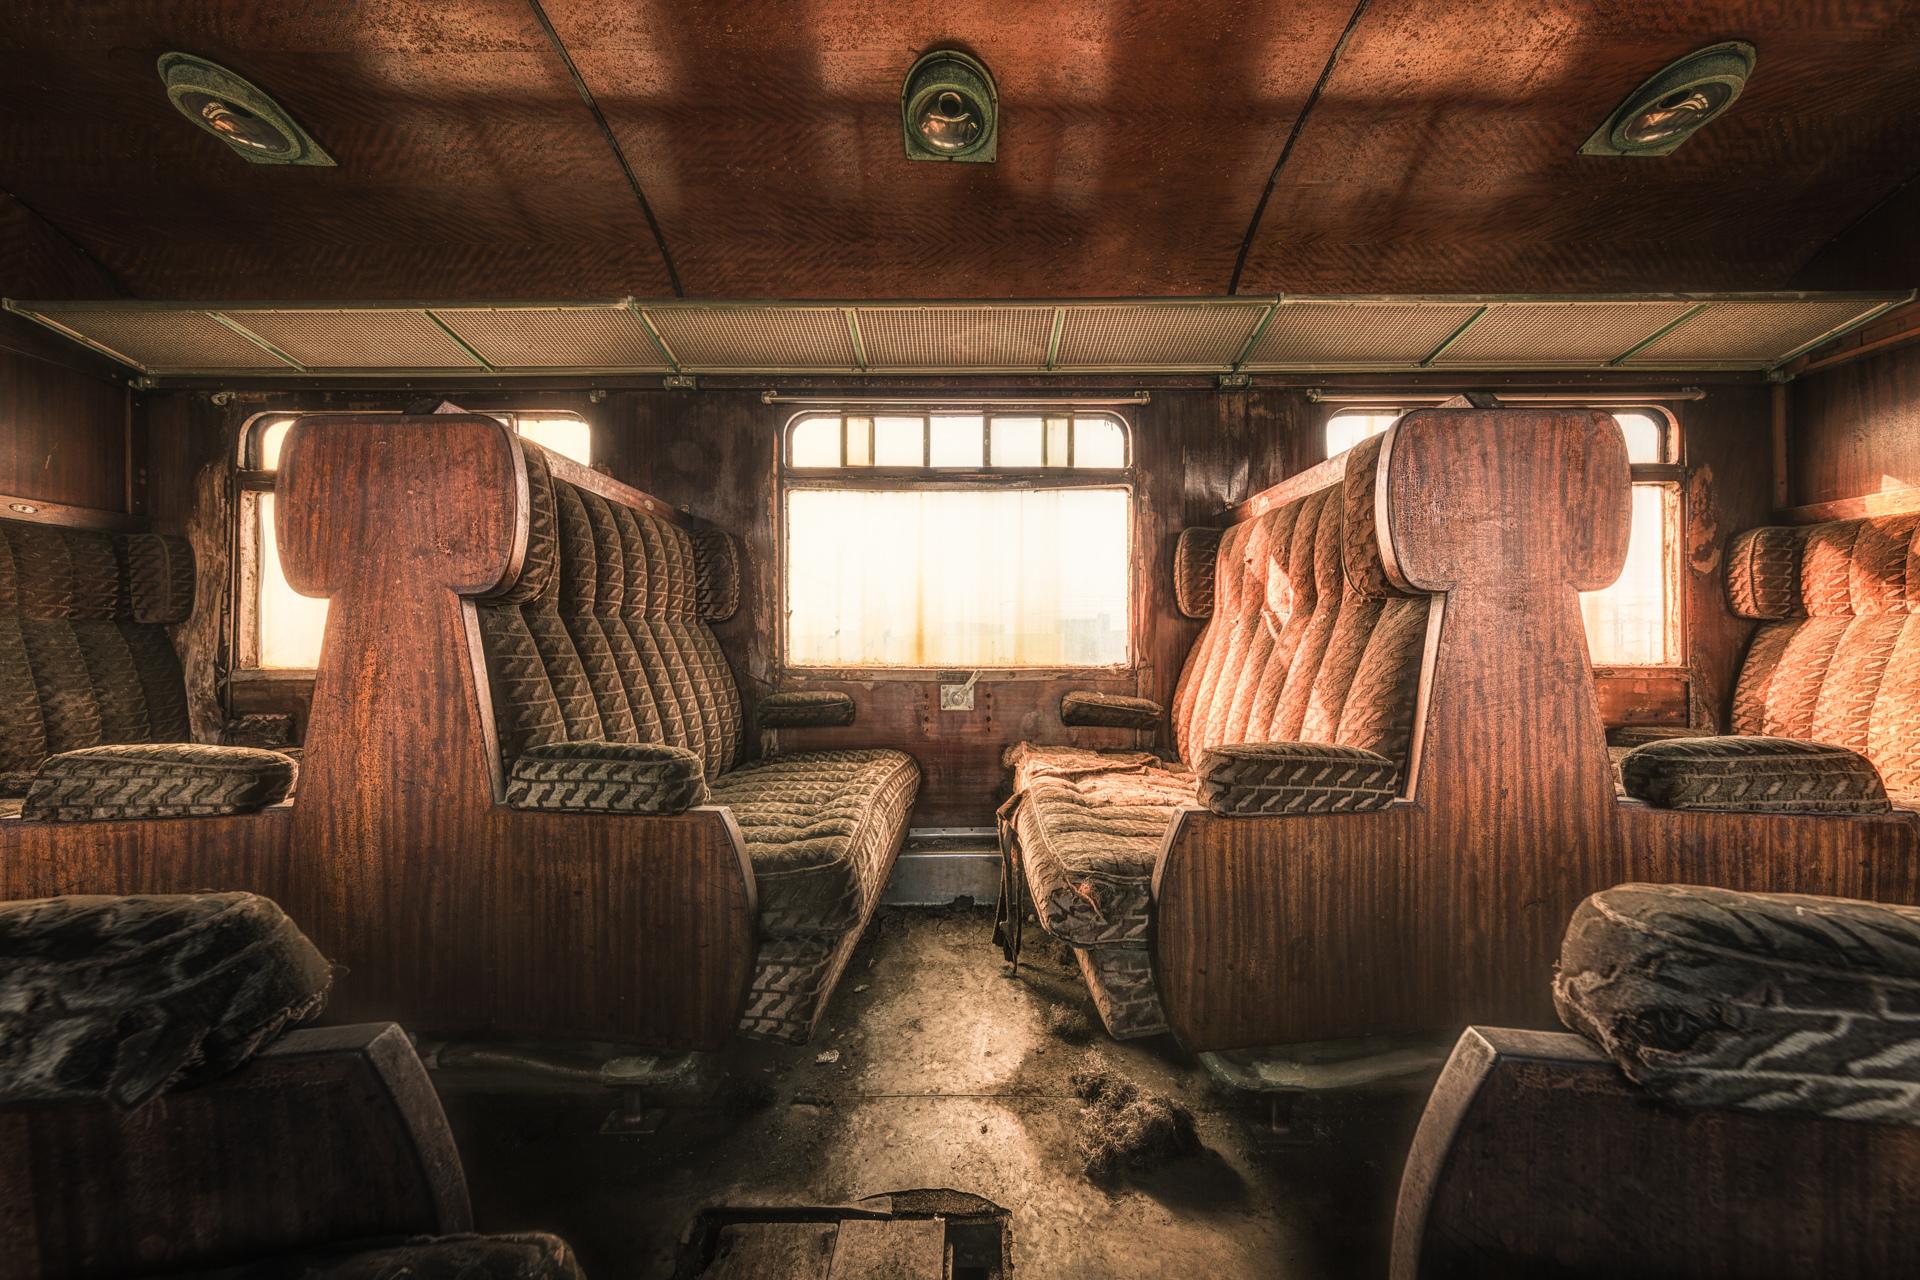 Urban Exploration - Orient Express - Final Destination